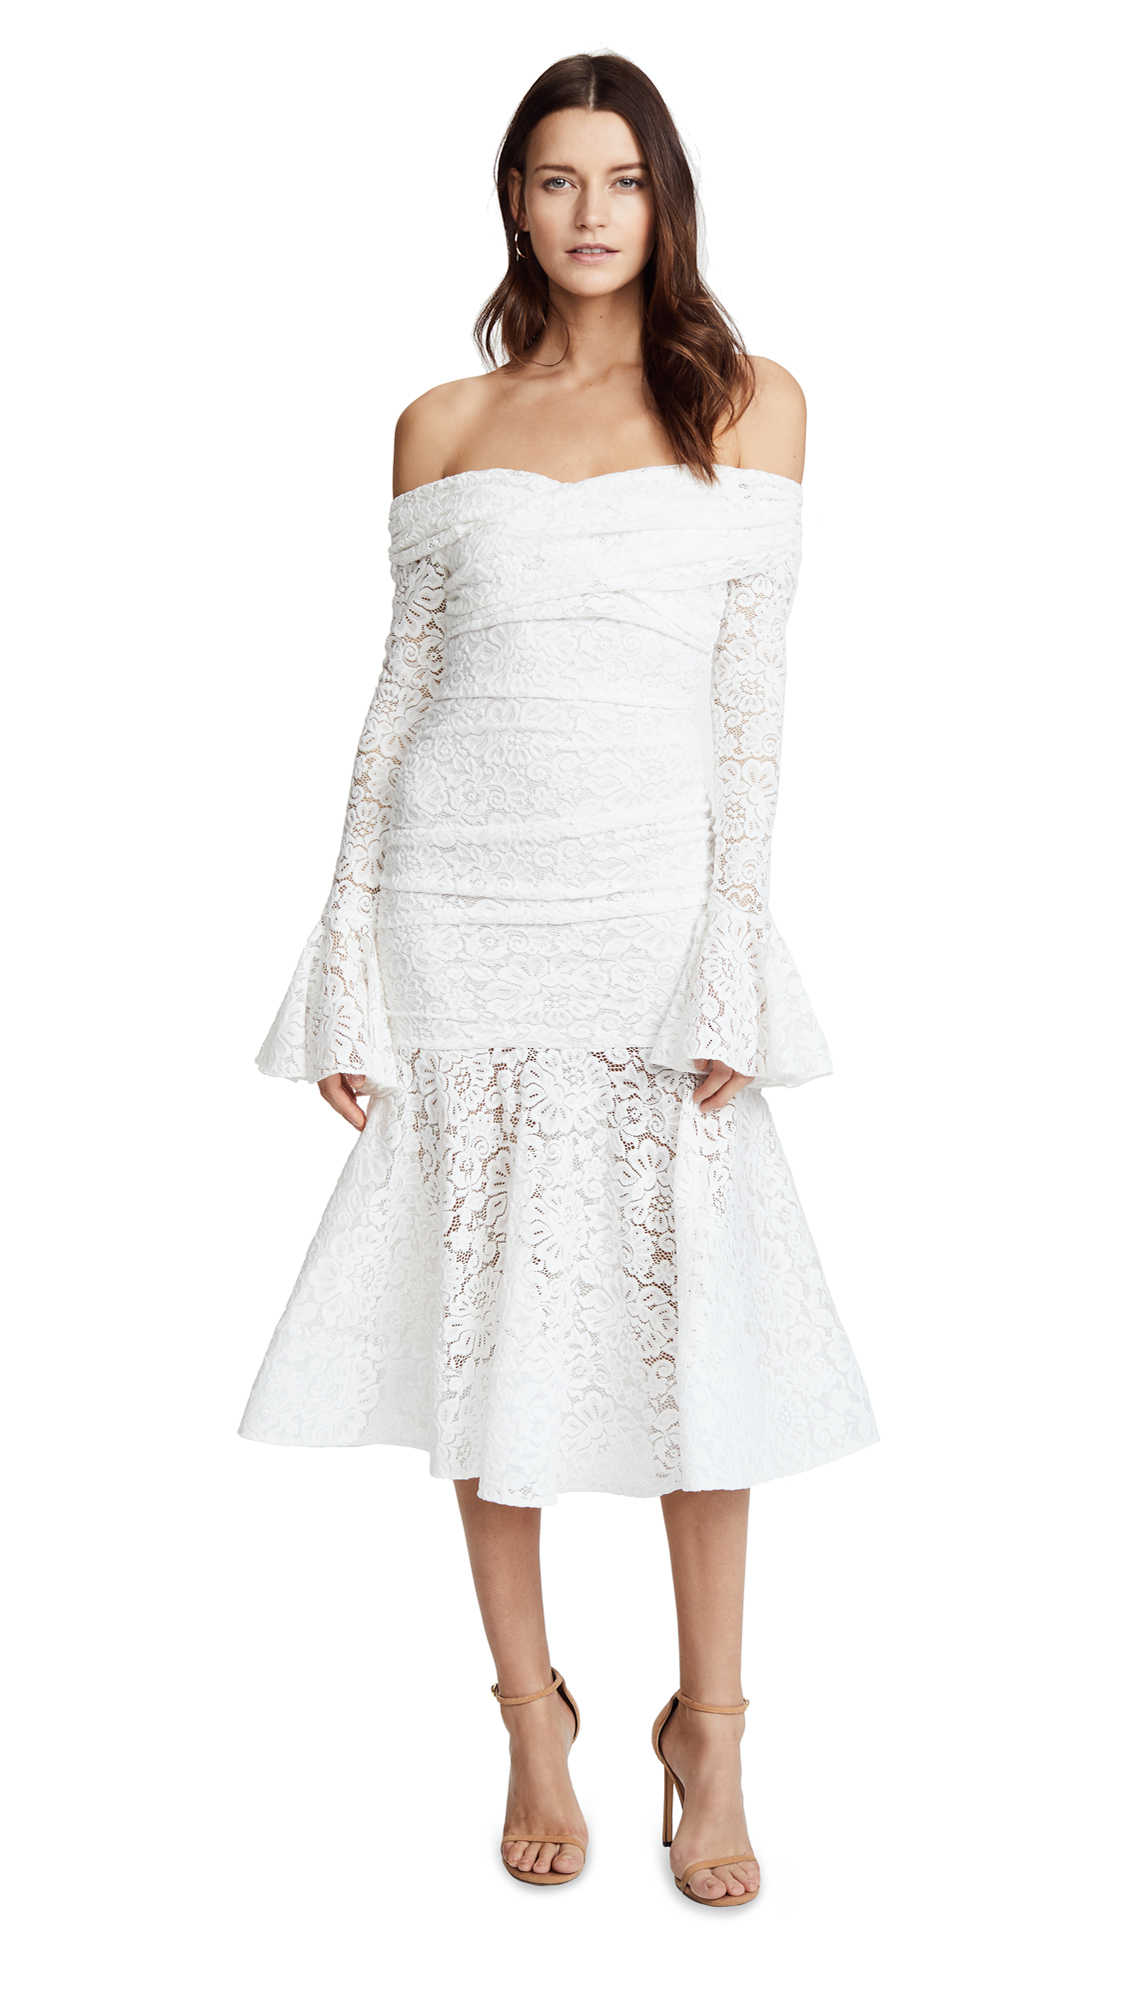 Caroline Constas Leda Dress - White